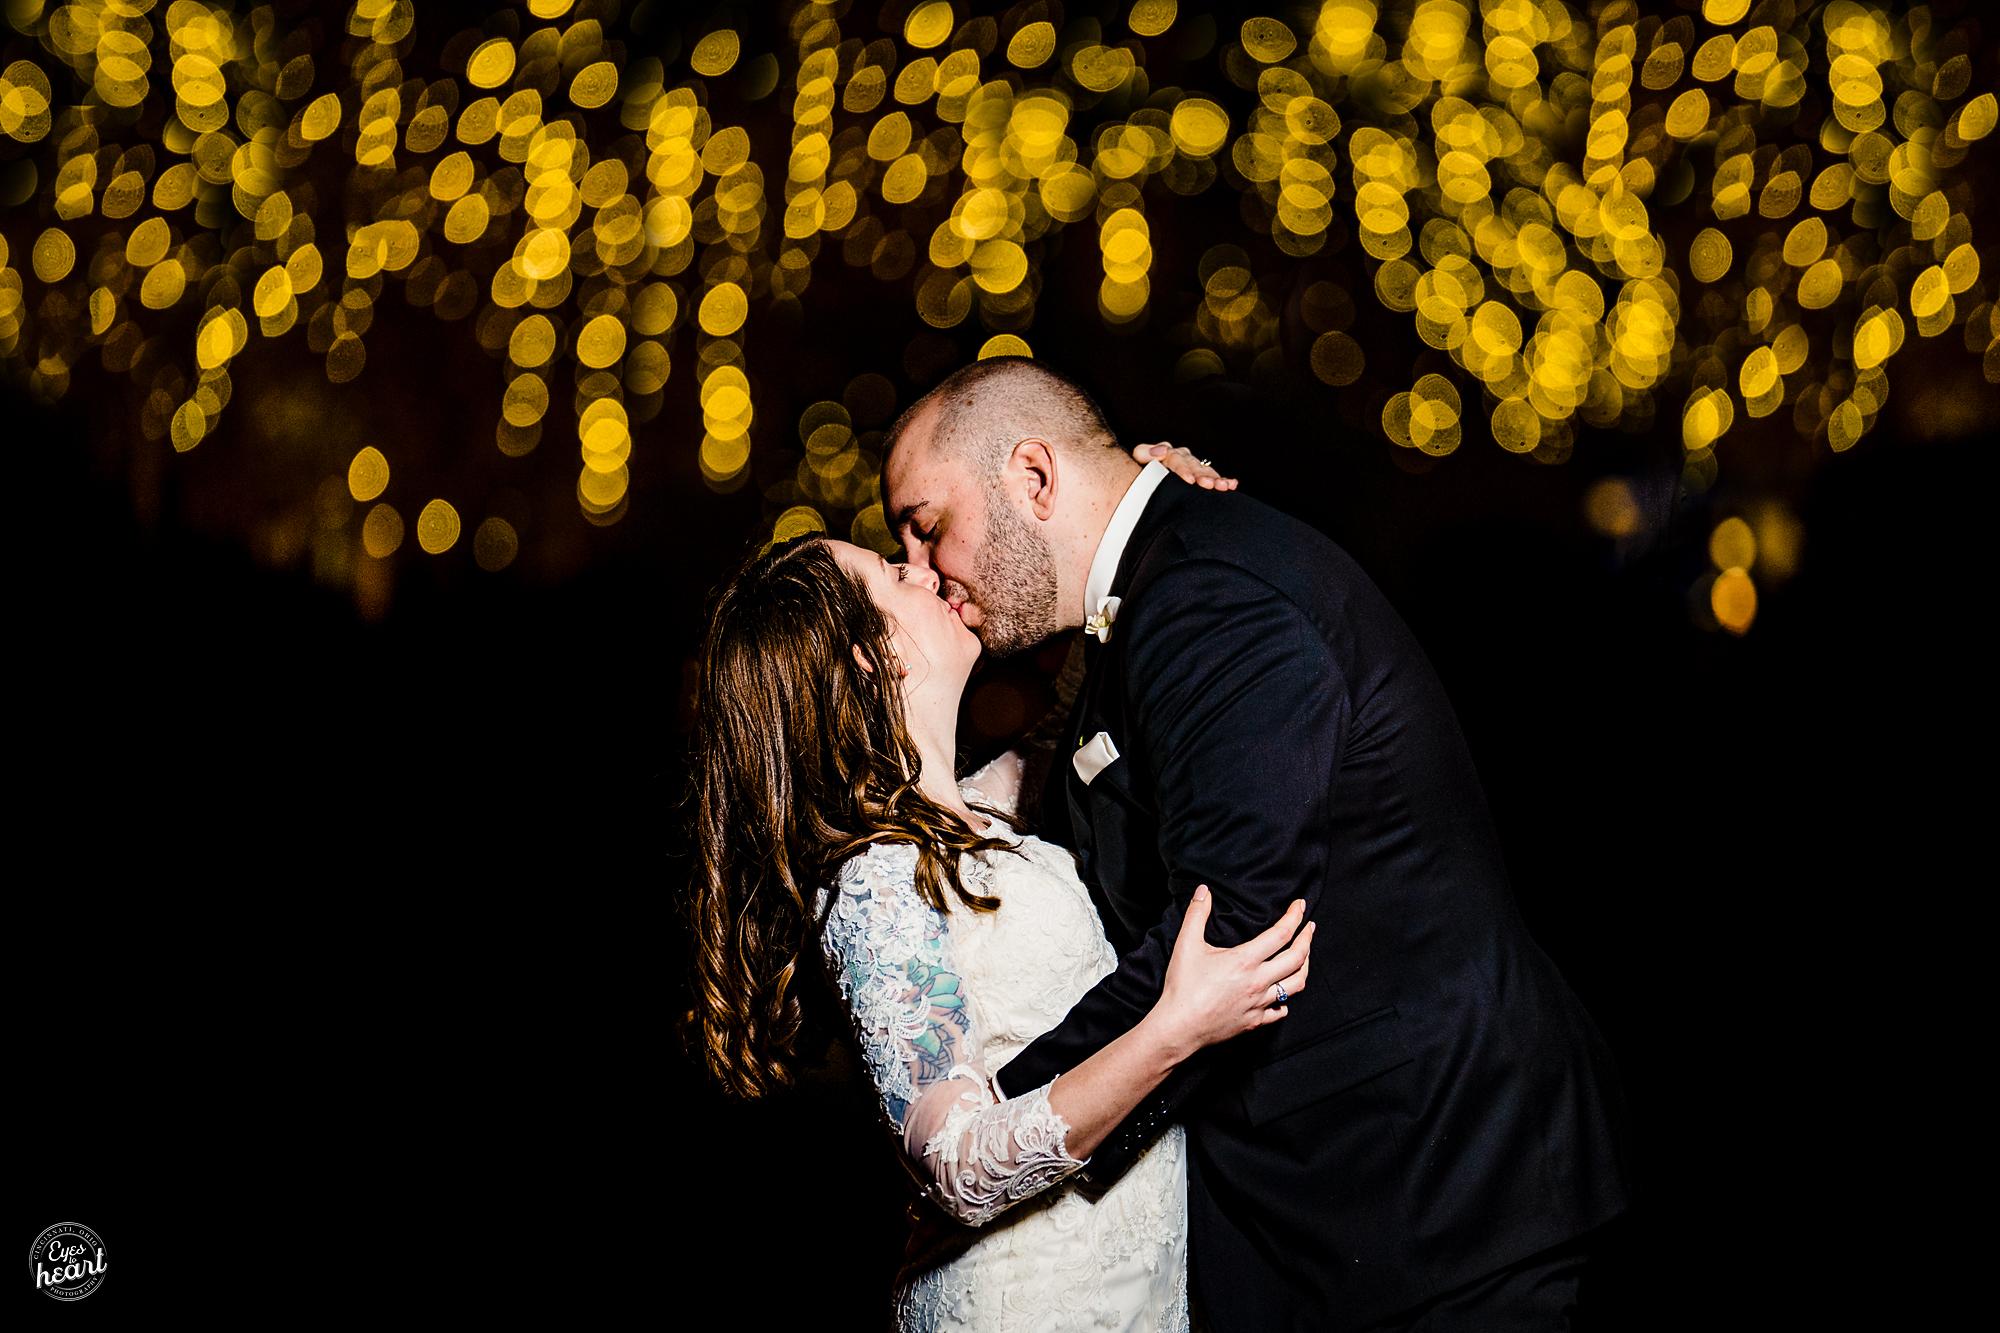 Oxford-Community-Arts-Center-Wedding-Photography-25.jpg